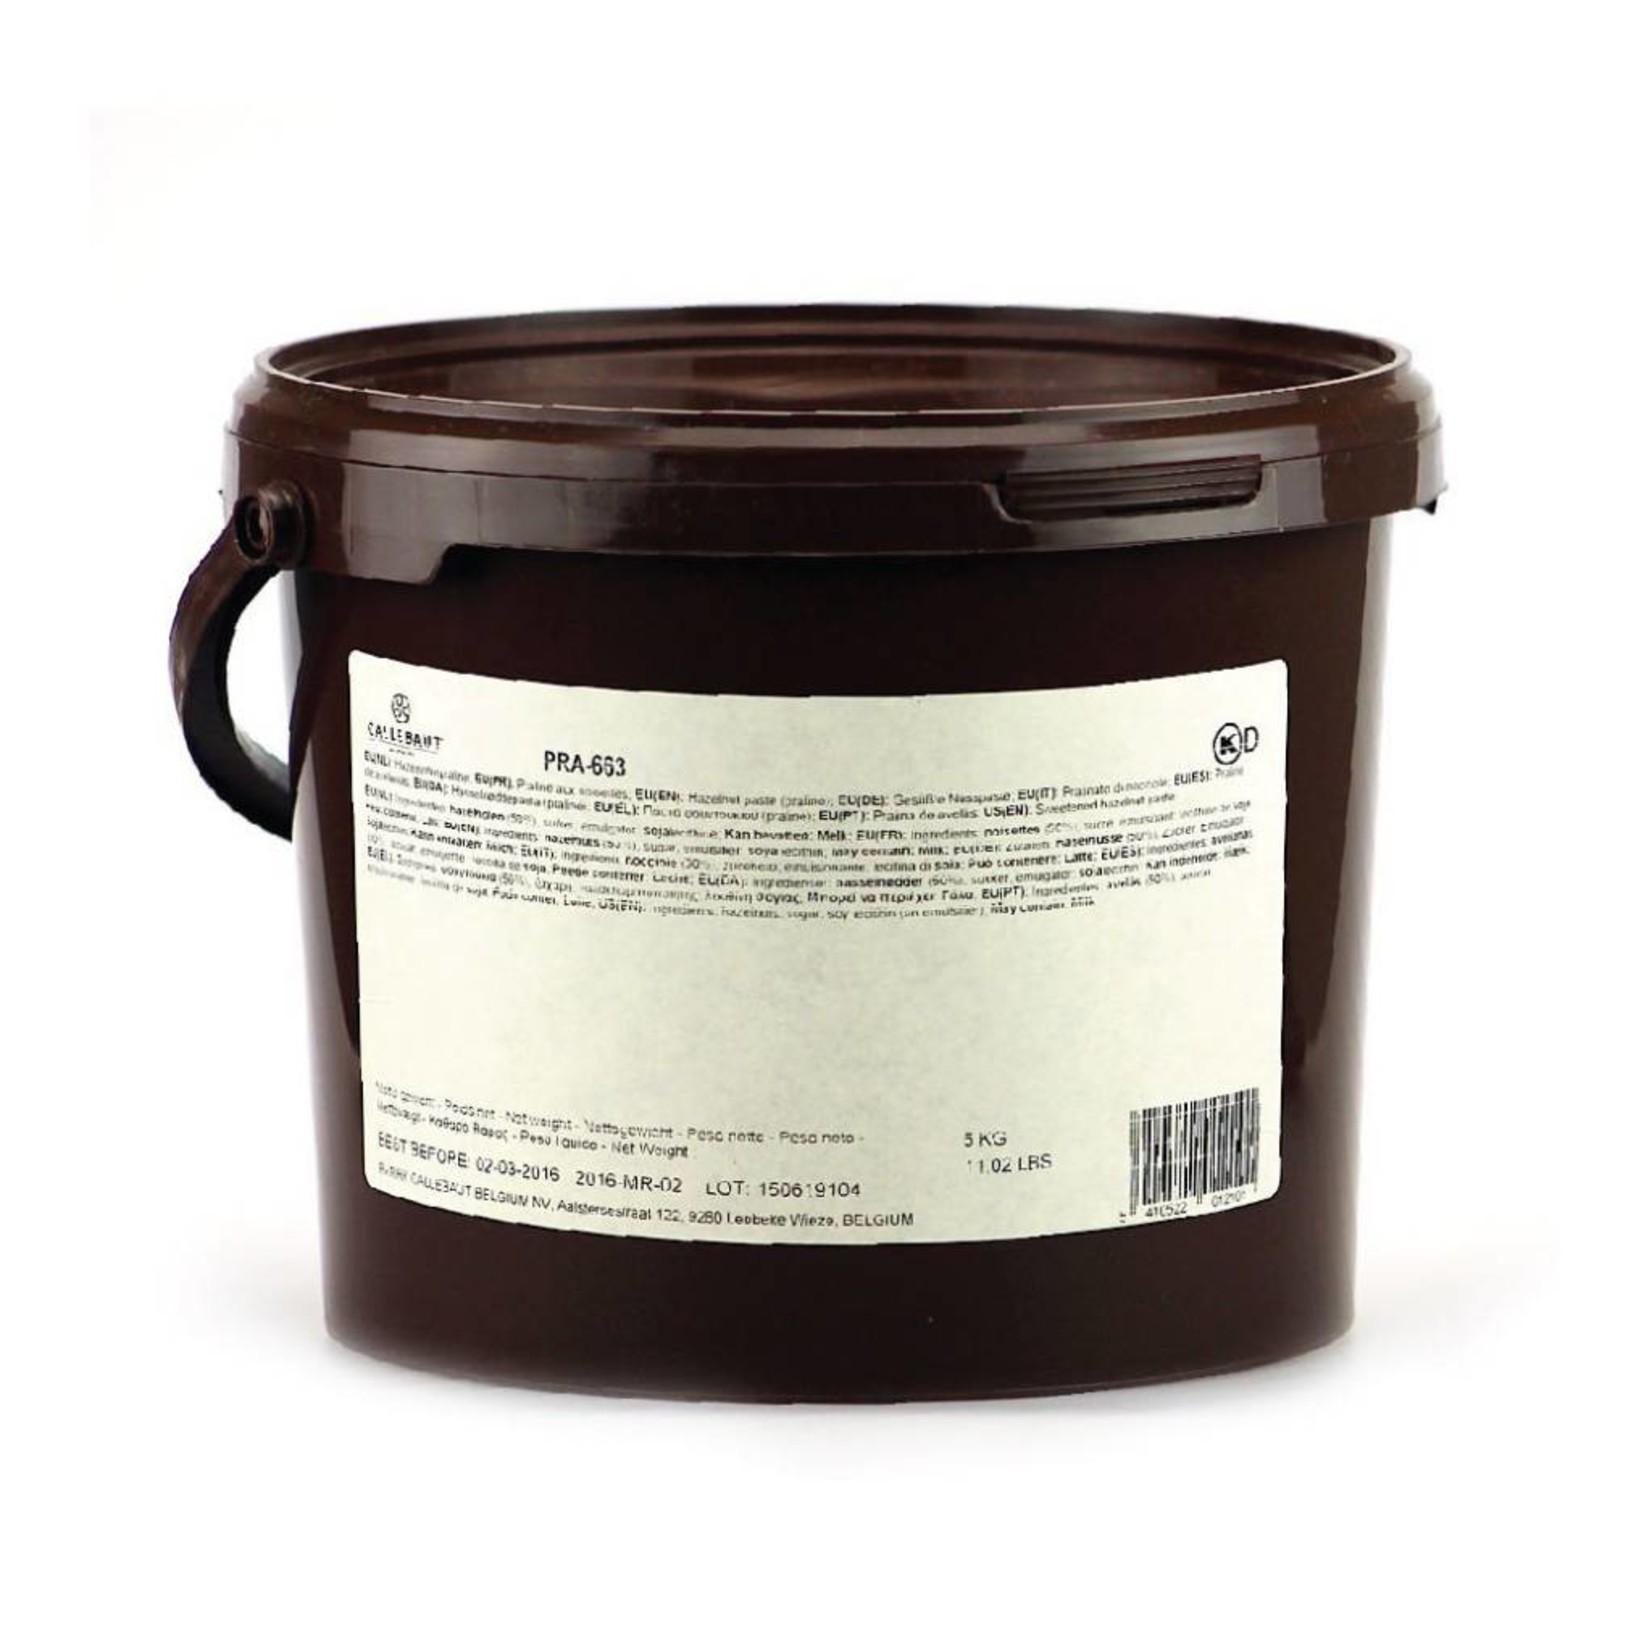 Barry Callebaut Barry Callebaut - Hazelnut Praline Paste - 50% Hazelnuts - 5kg/11lb, PRA-663